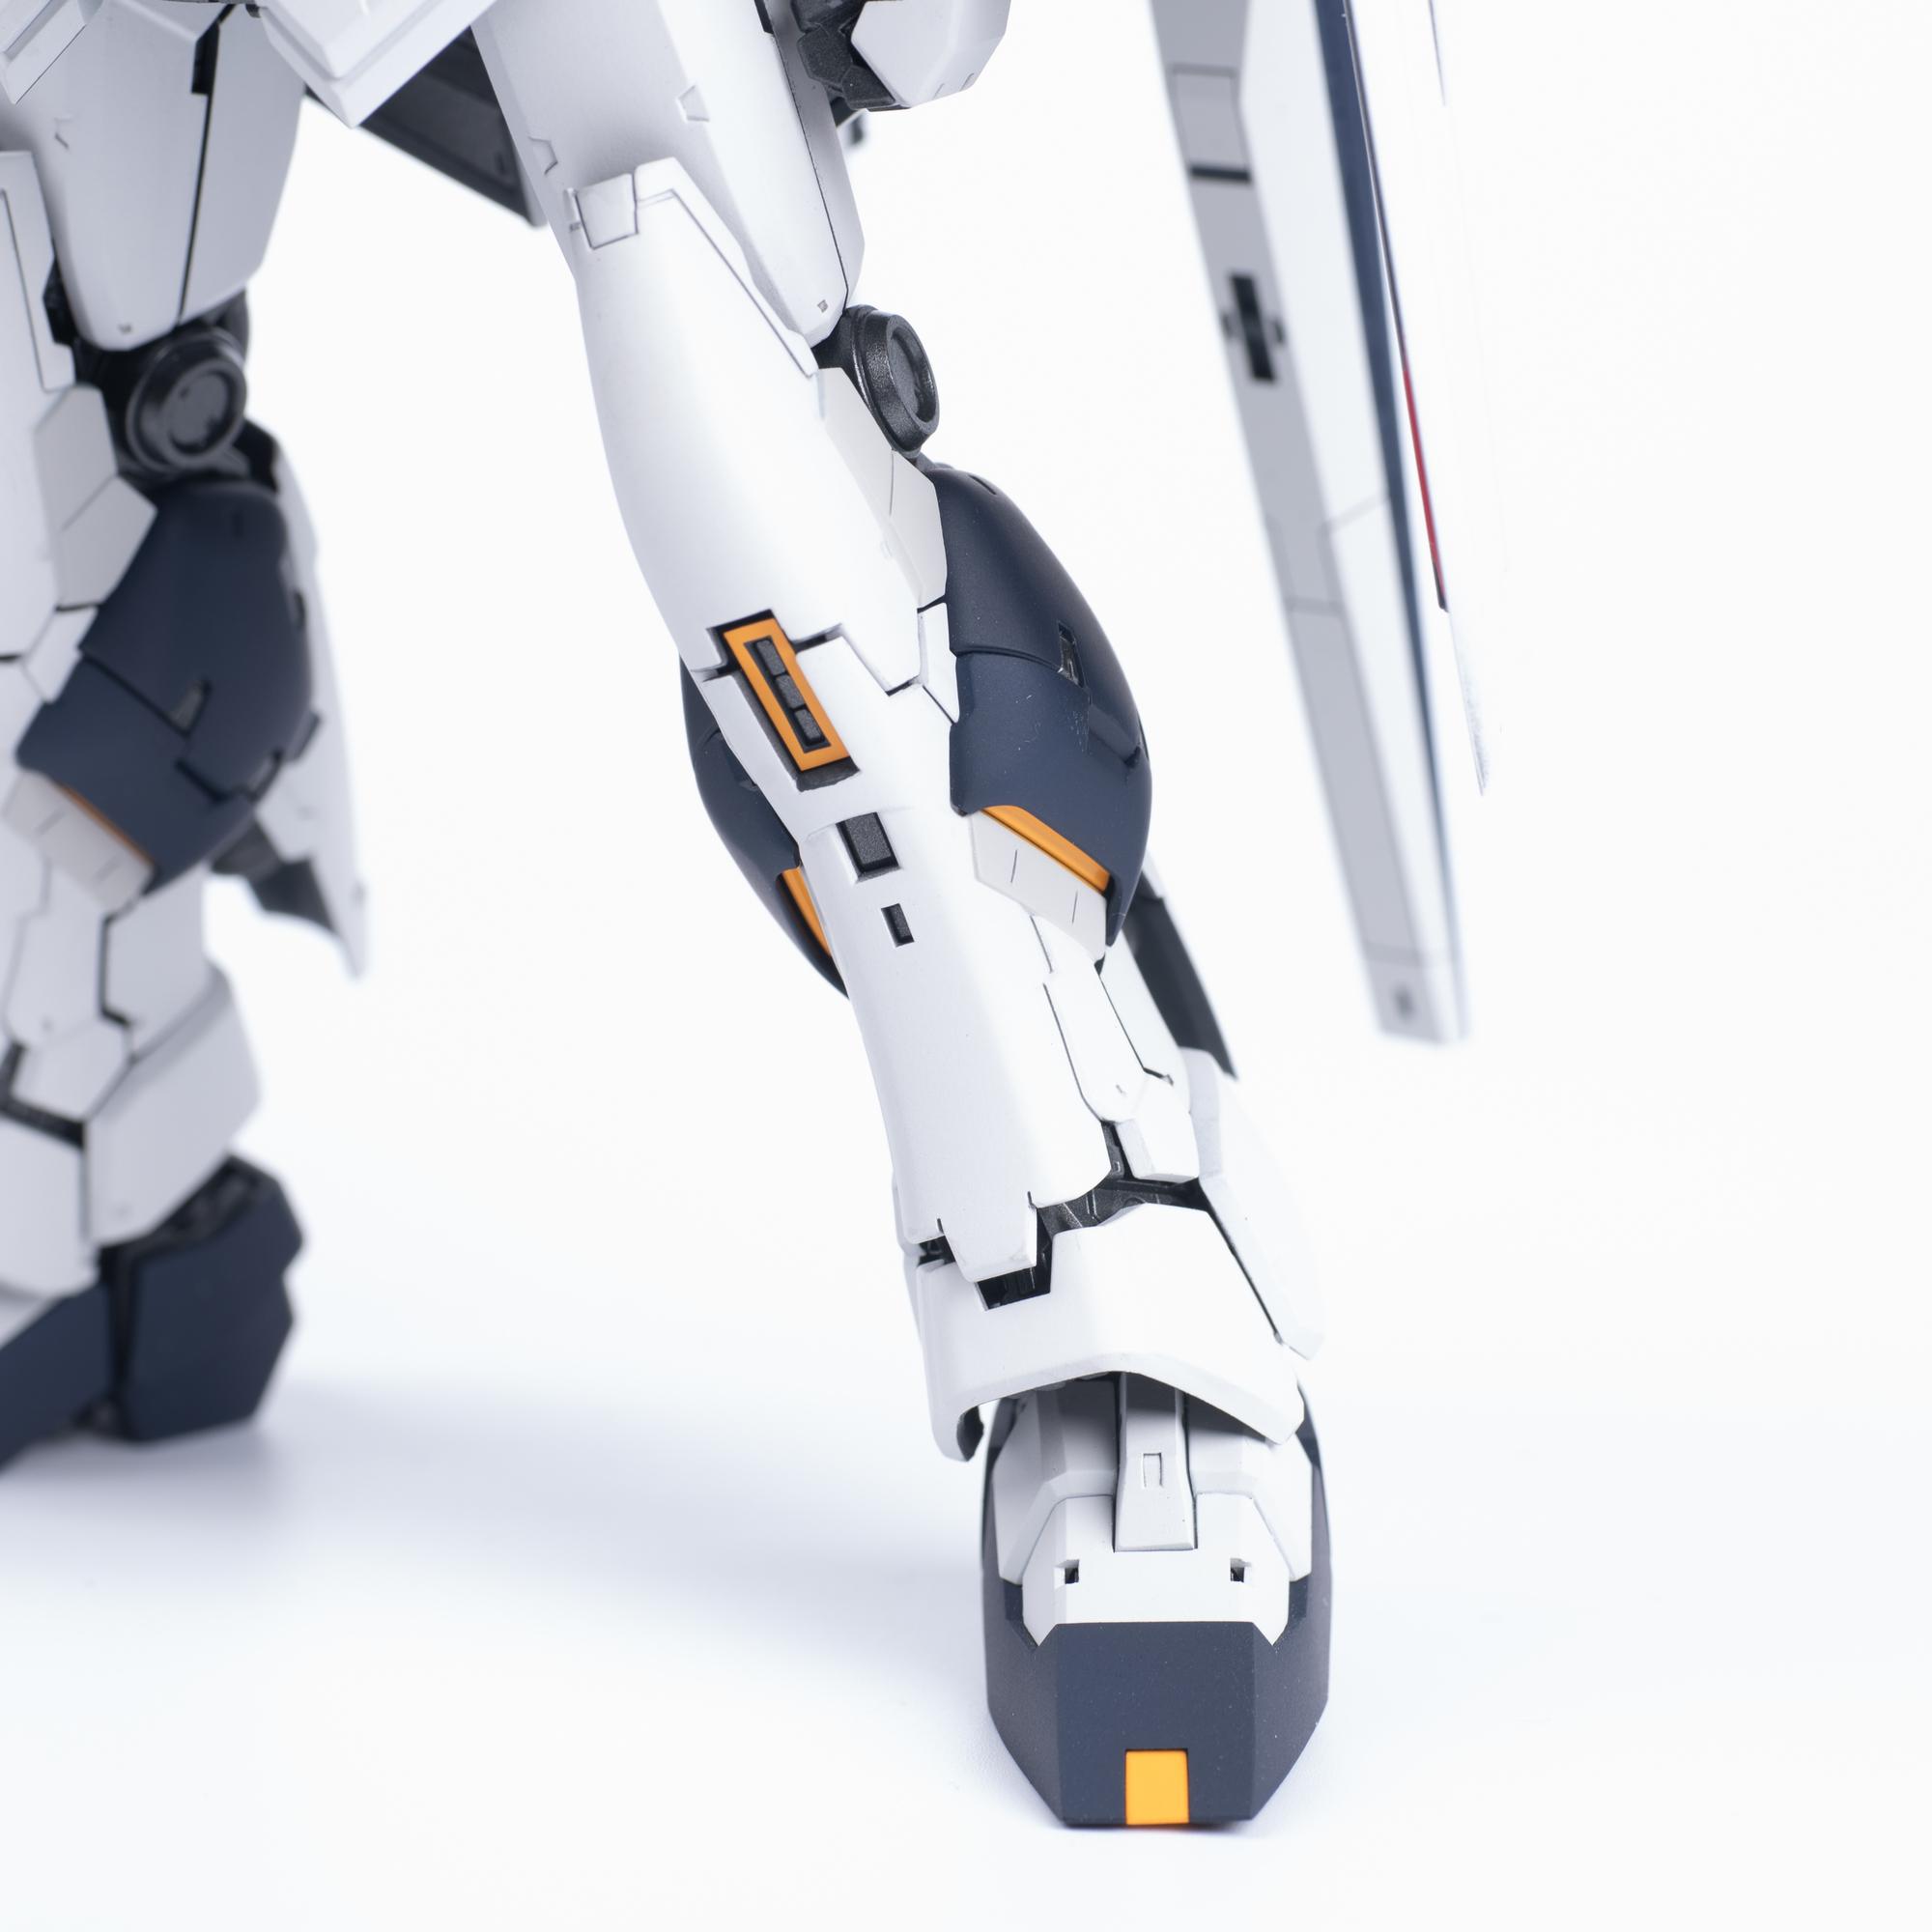 f:id:H-masatoshi:20191212011506j:plain